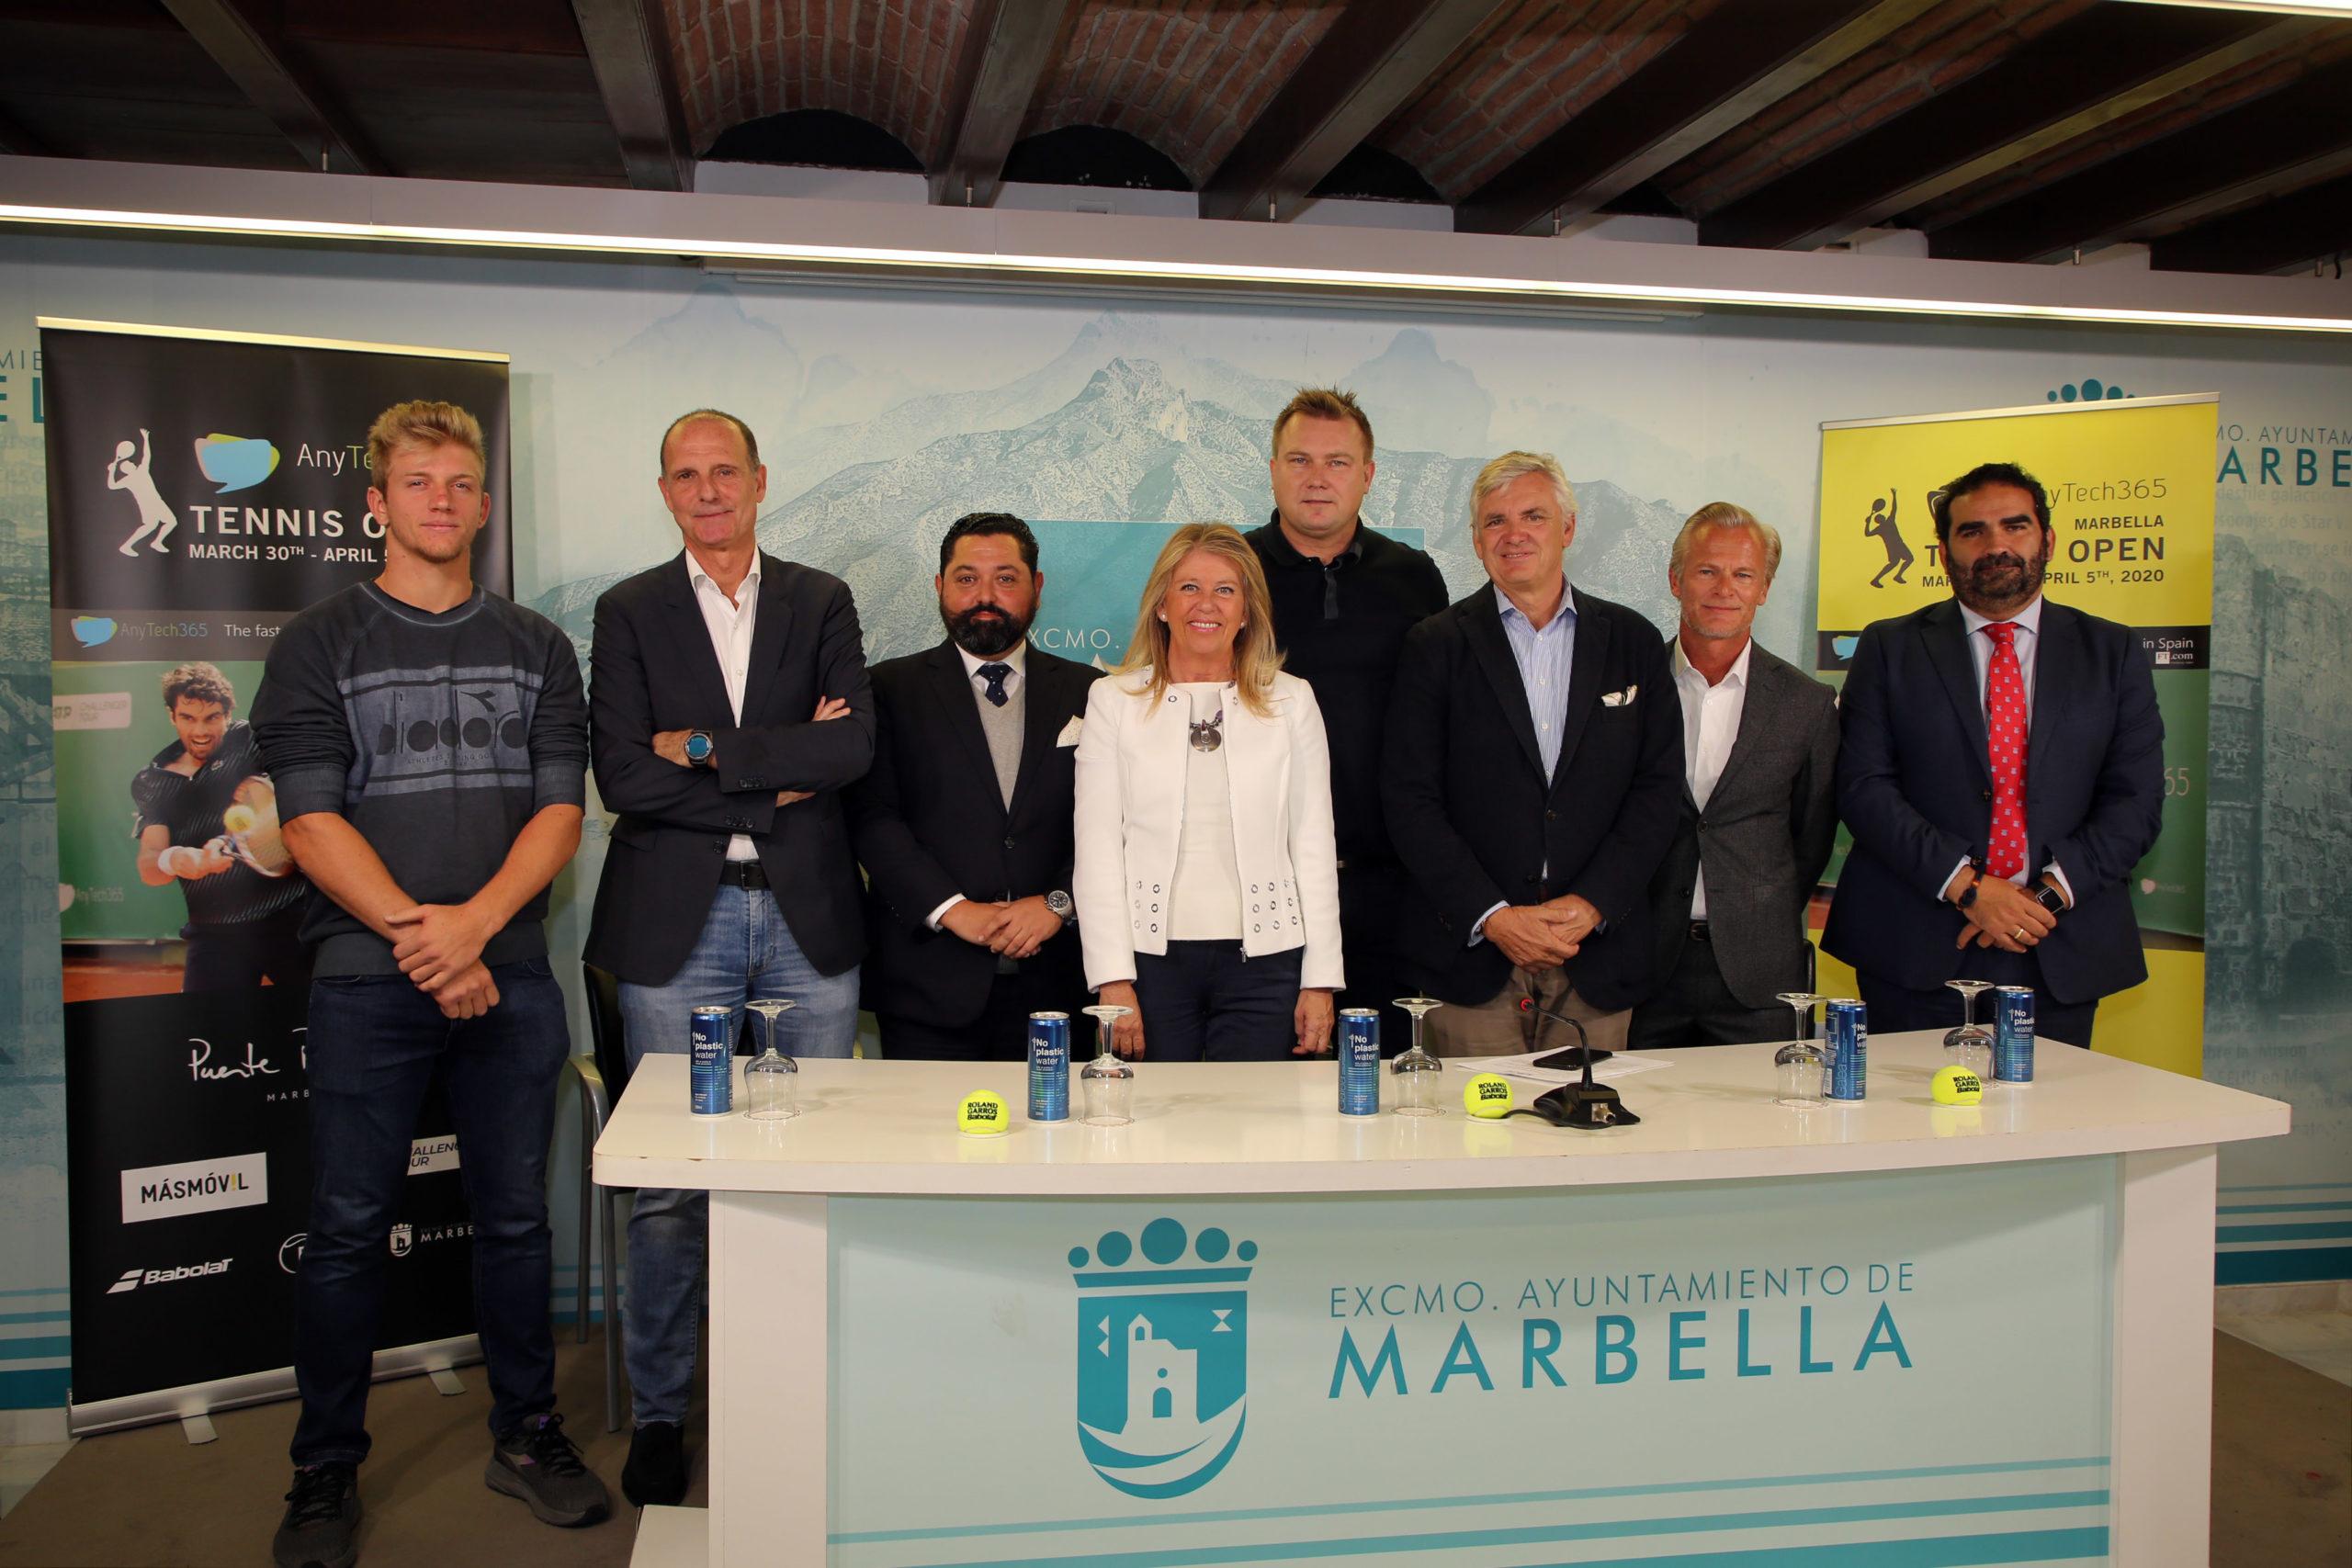 marbella tennis open